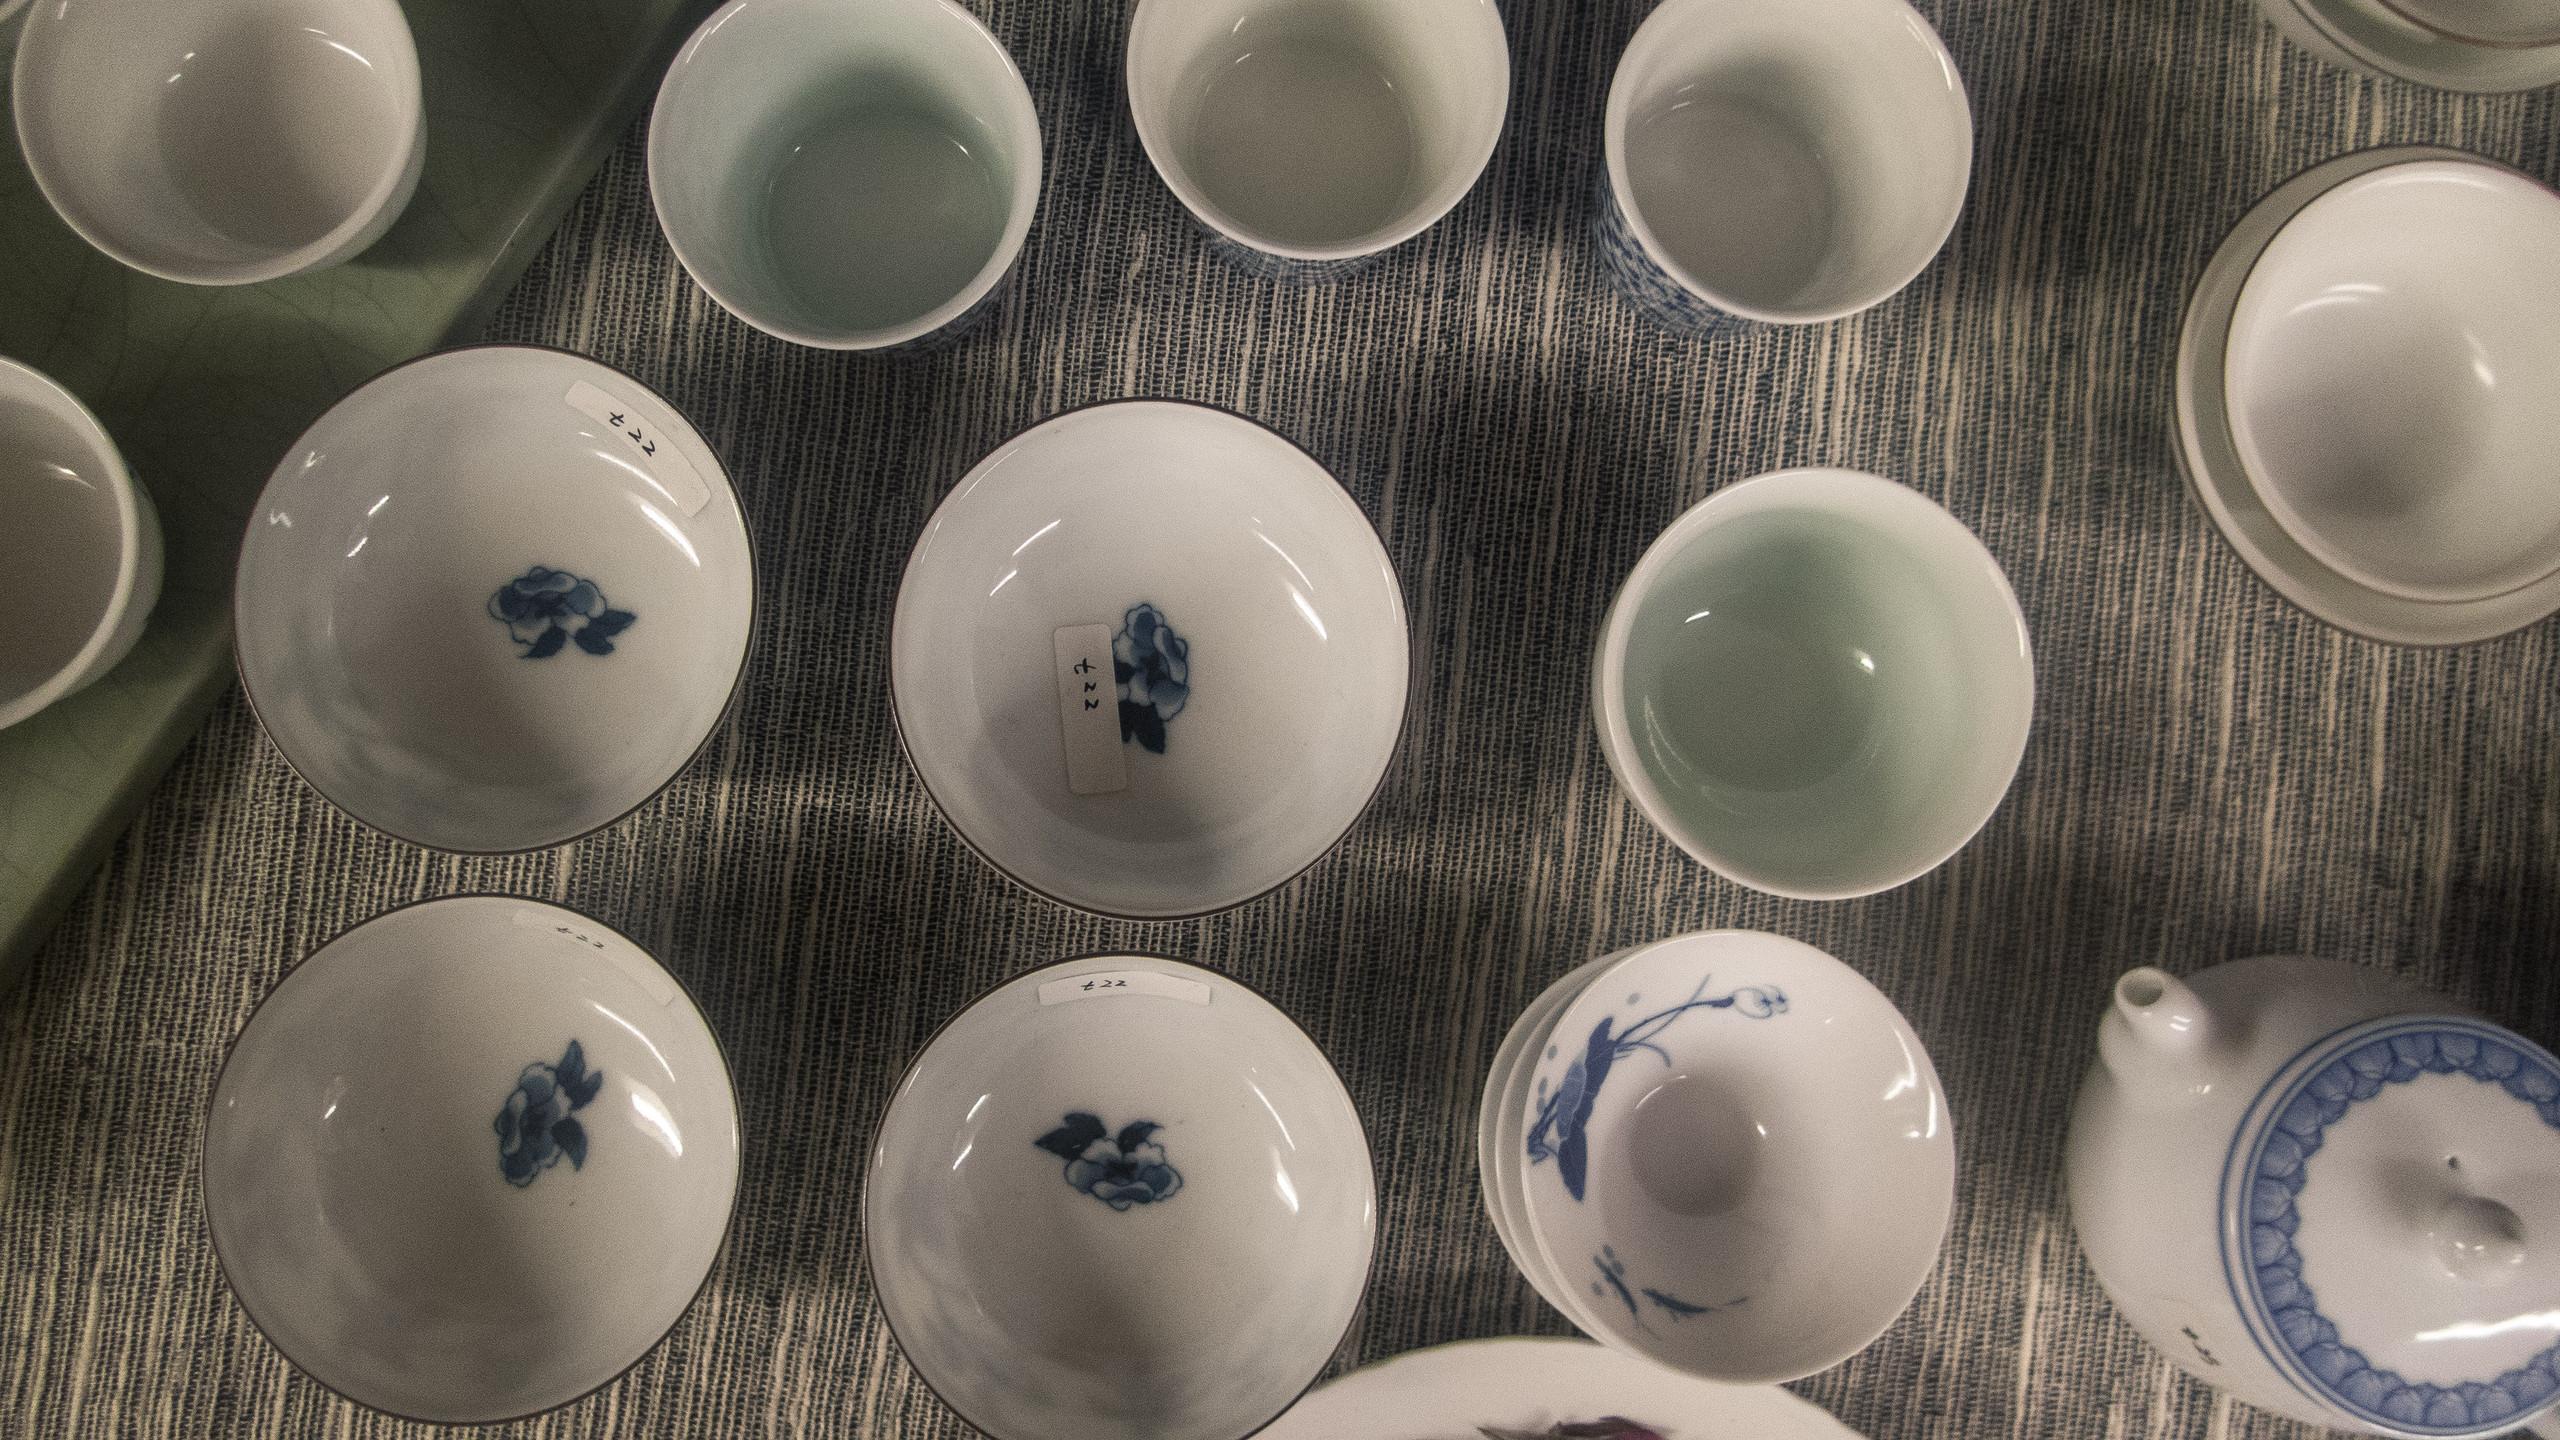 Simplicity in a teacup